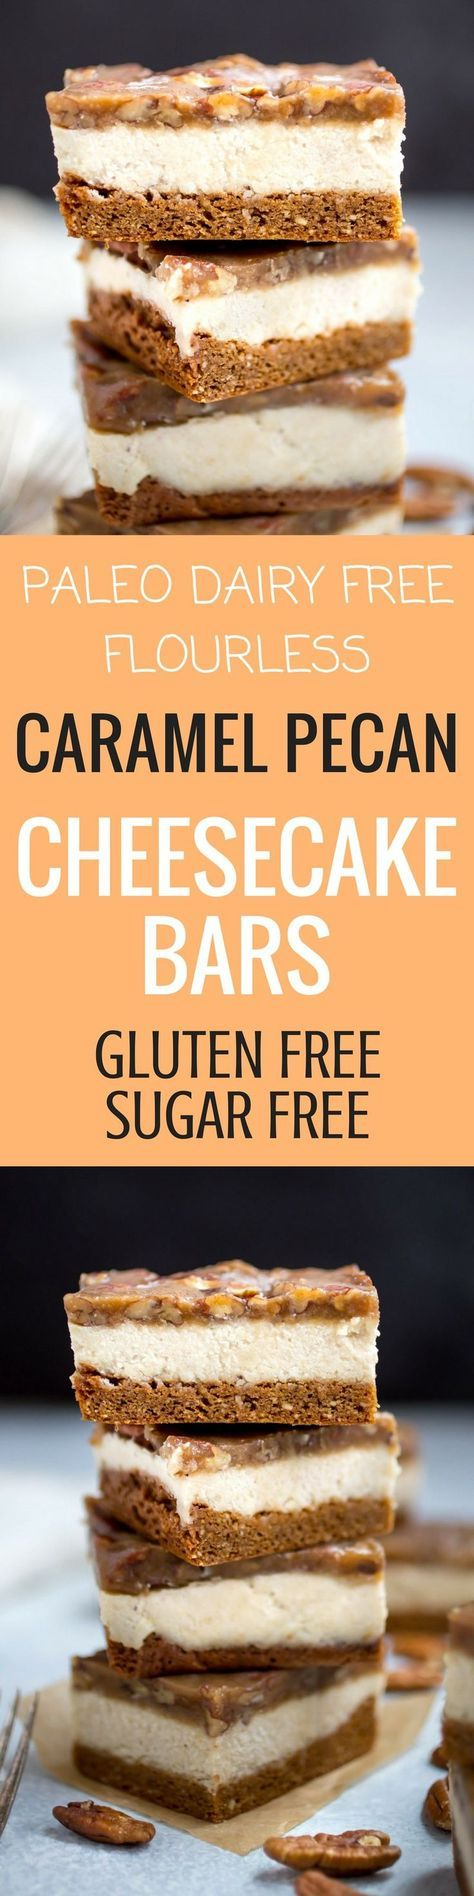 Best Dairy Free Paleo Caramel Pecan Cheesecake Bars. Easy healthy paleo treat. Gluten free dessert recipes. Paleo recipes for beginners.